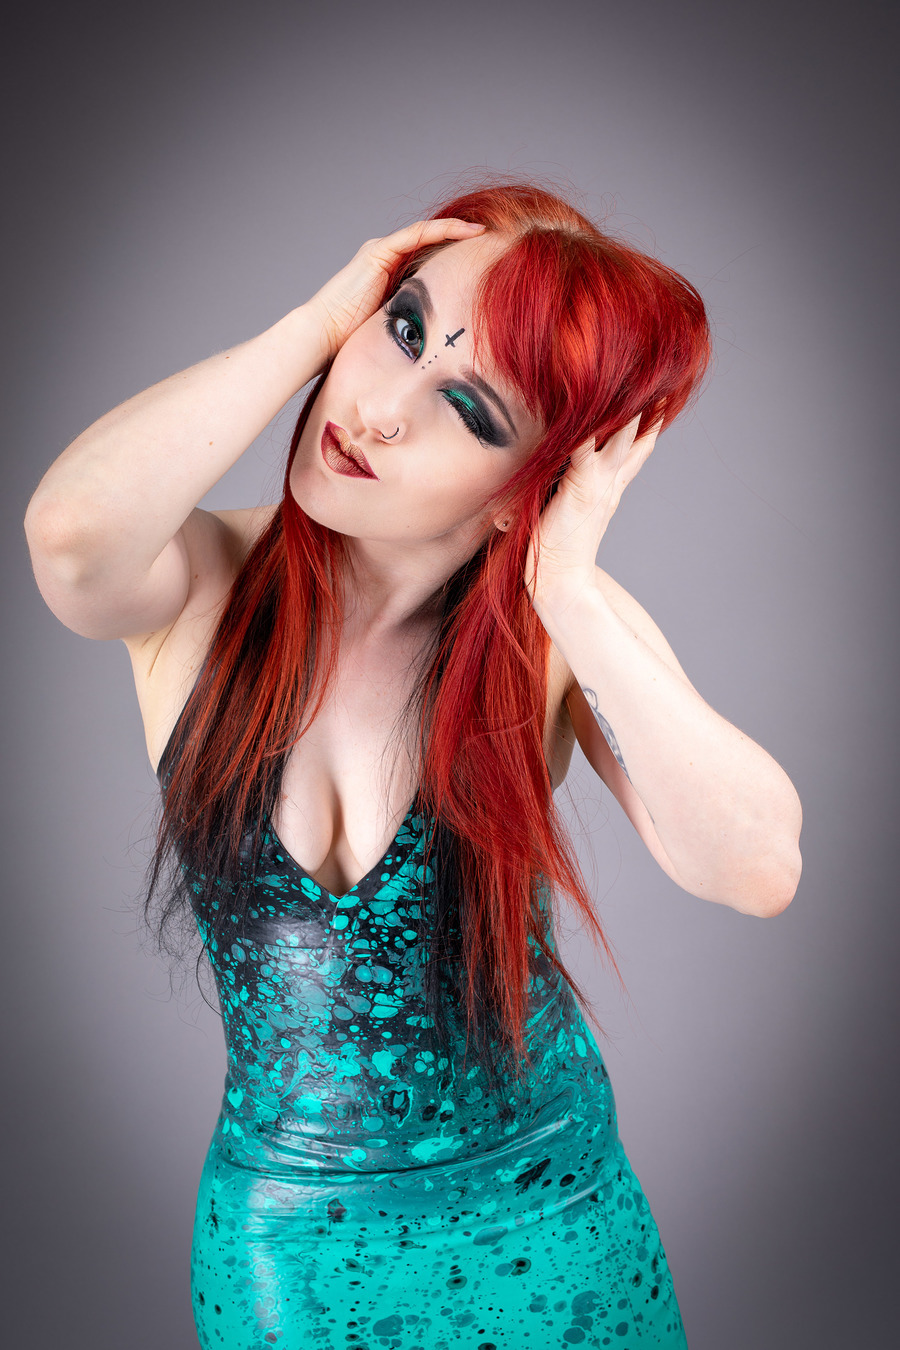 Photography by Latex & Lingerie, Model Alixxiia, Makeup by Kjlemon, Hair styling by Kjlemon / Uploaded 18th September 2018 @ 08:08 PM